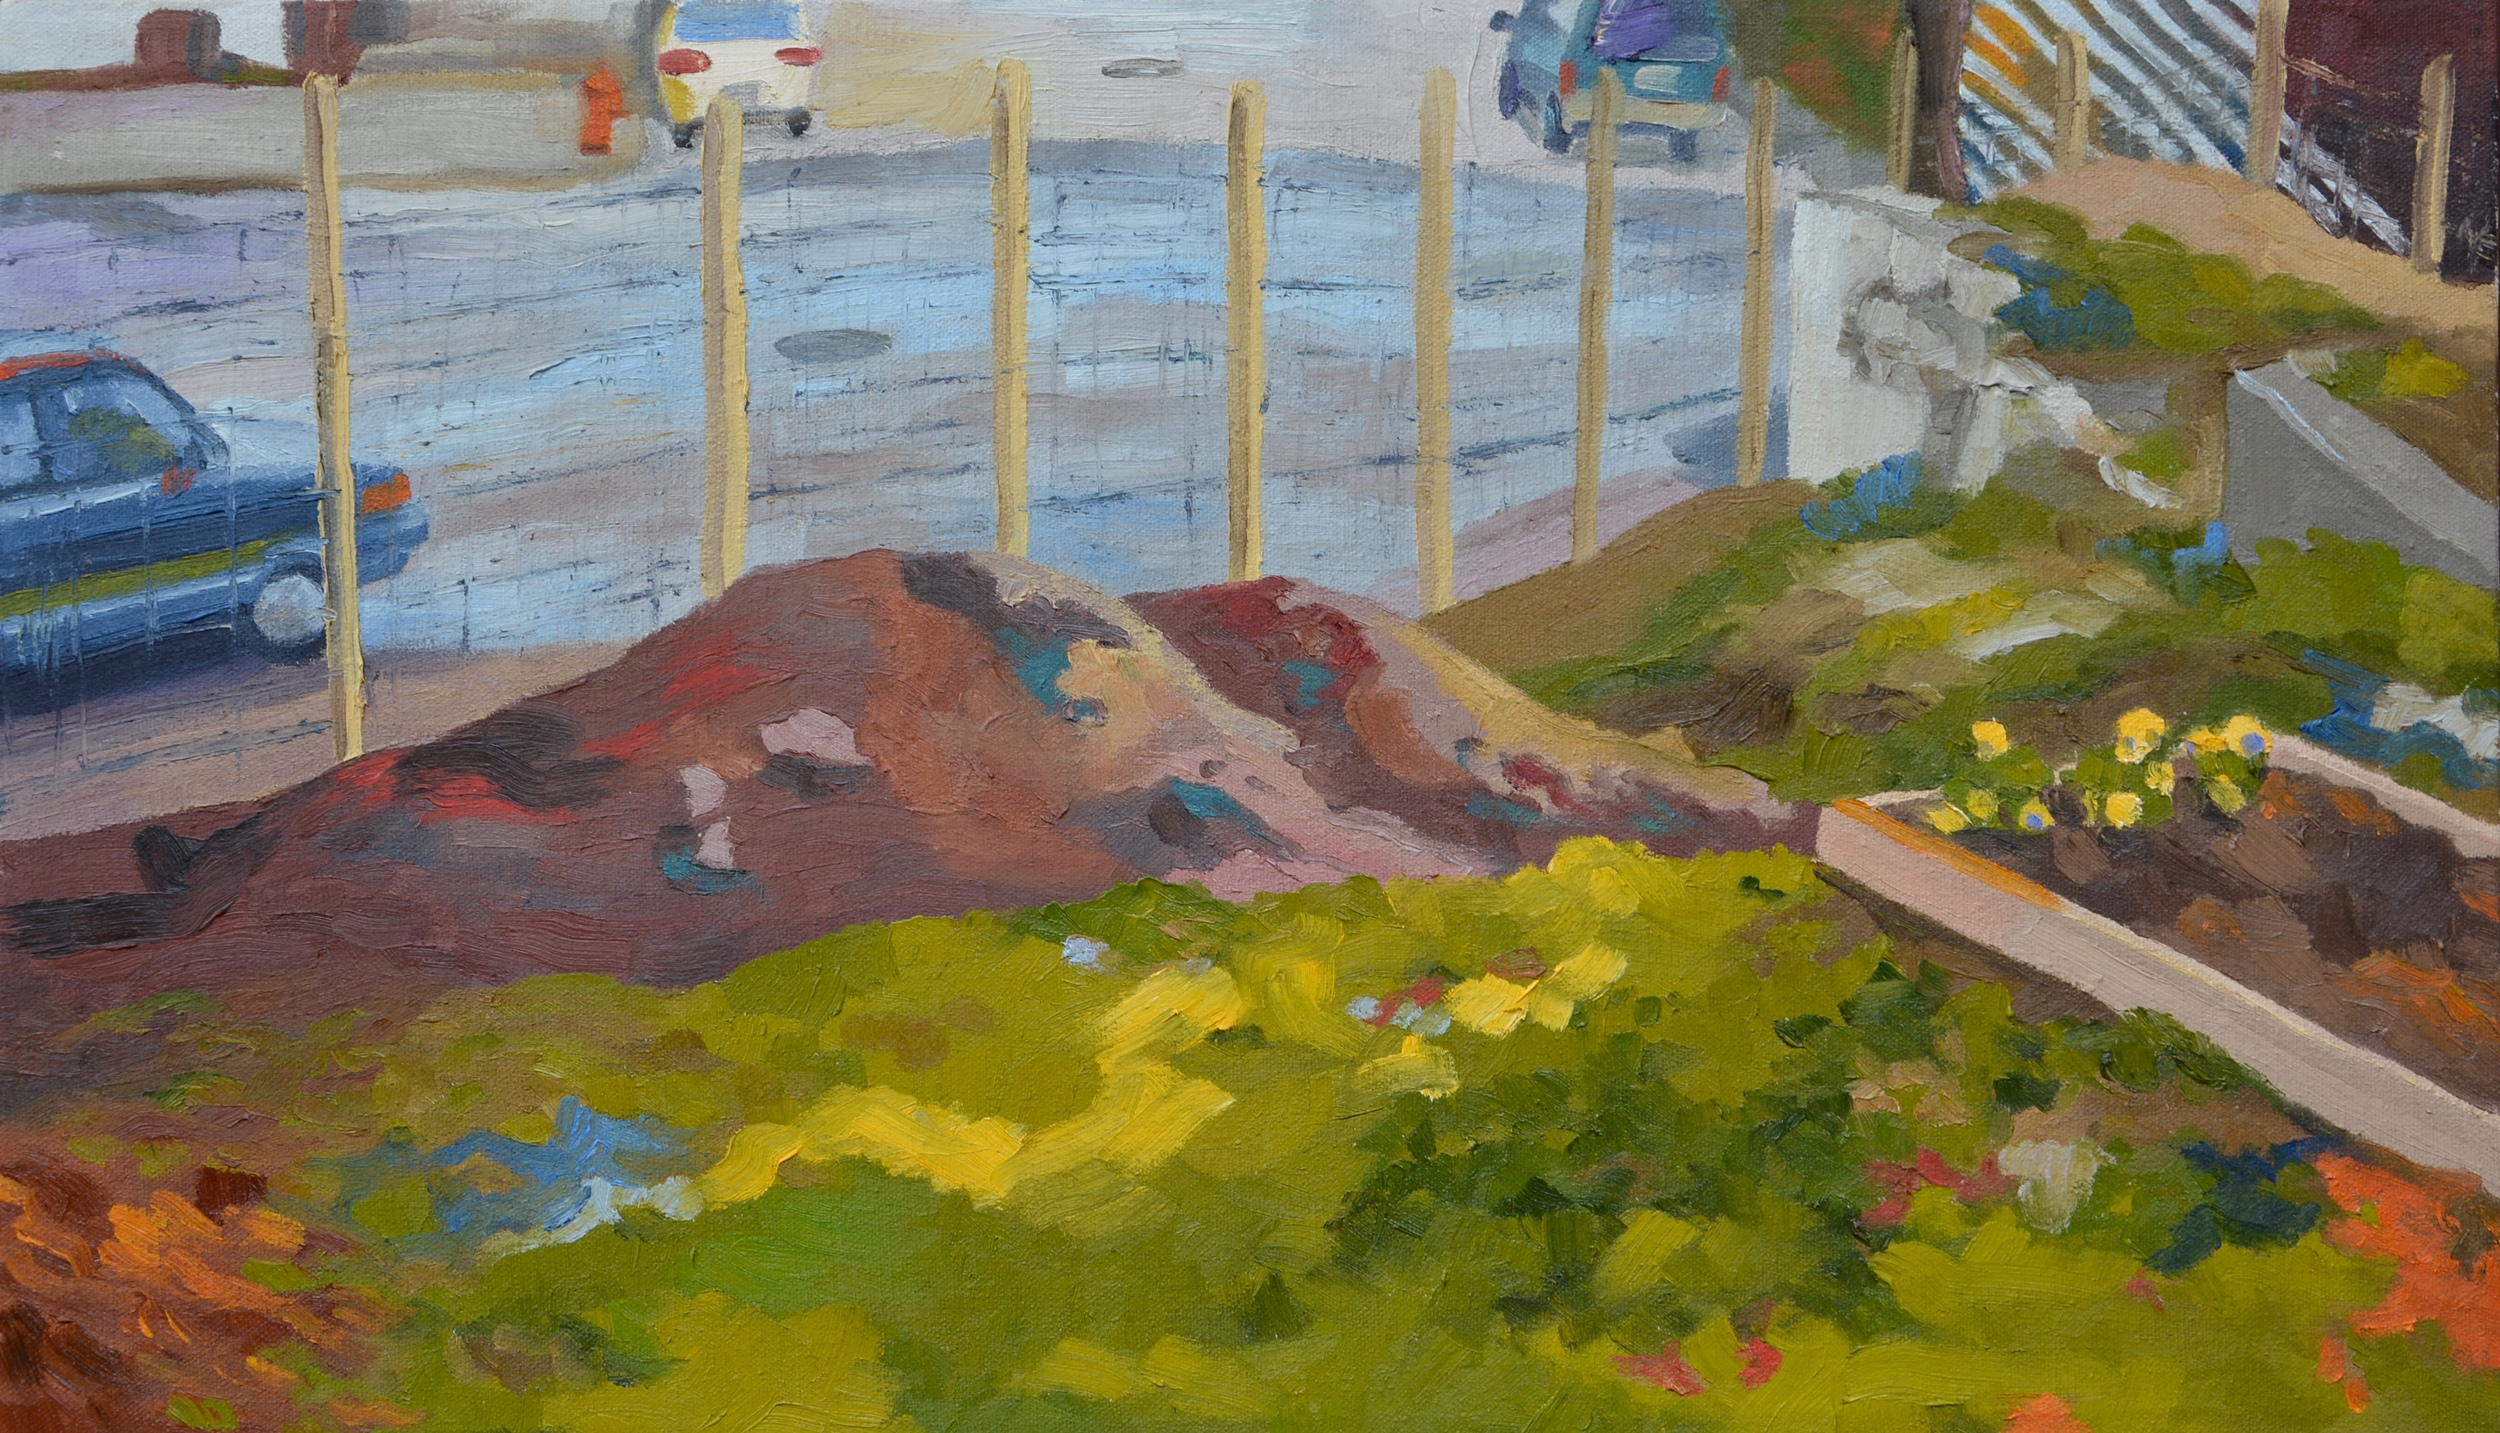 Garden in the Beginning, 24x14', oil on canvas, 2007